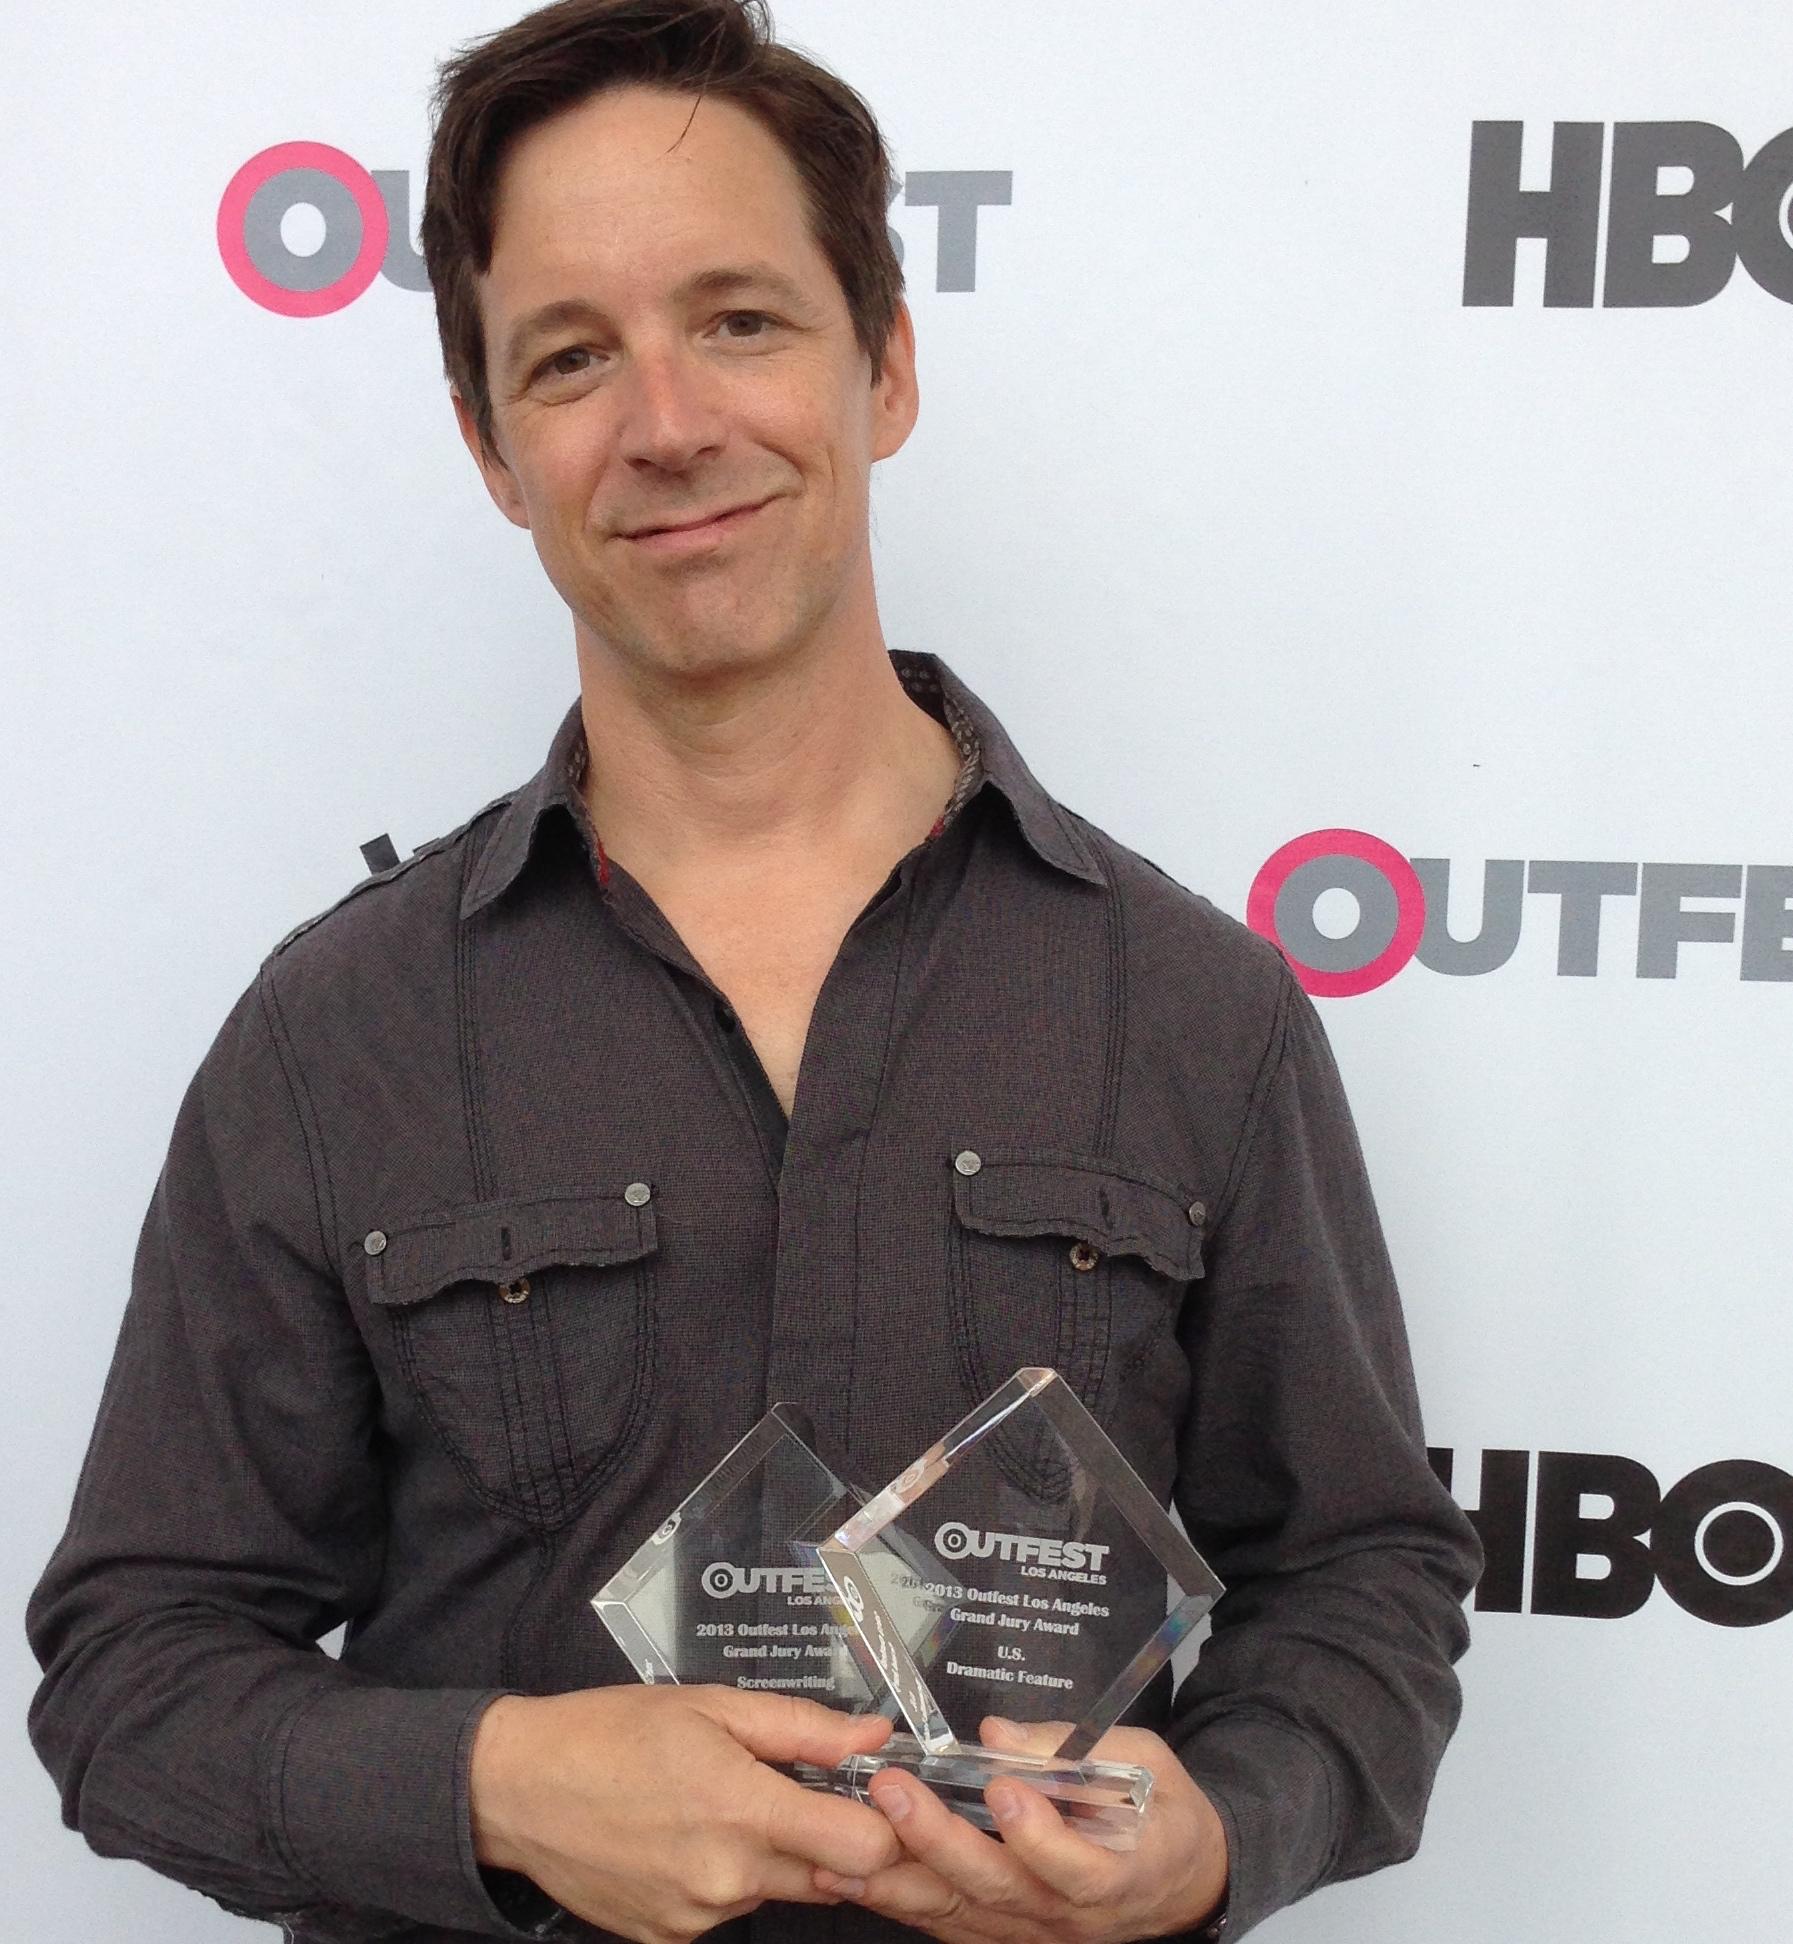 Outfest Awards Avatar.jpg